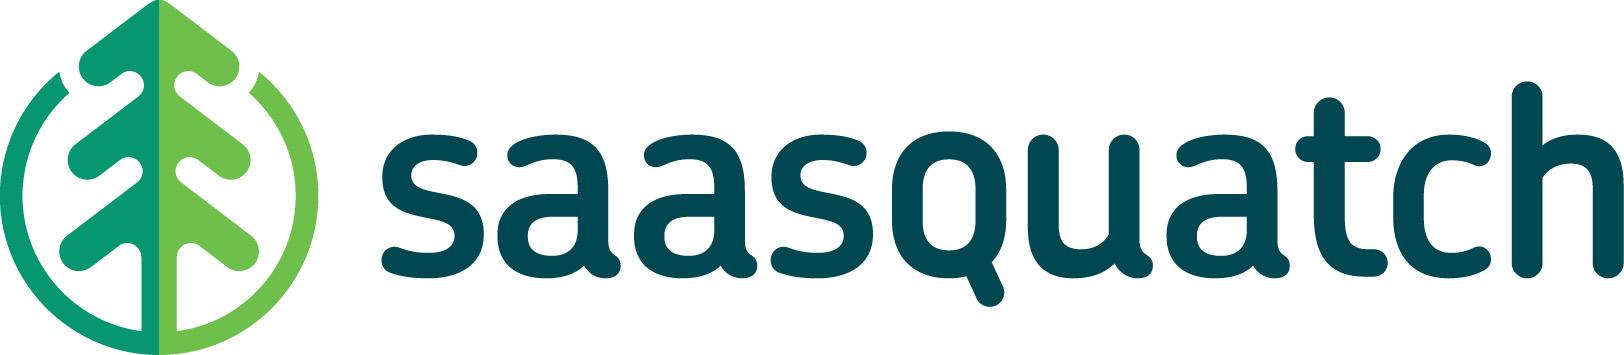 saasquatch-logo-left-no-slogan_RGB-300dpi.jpg